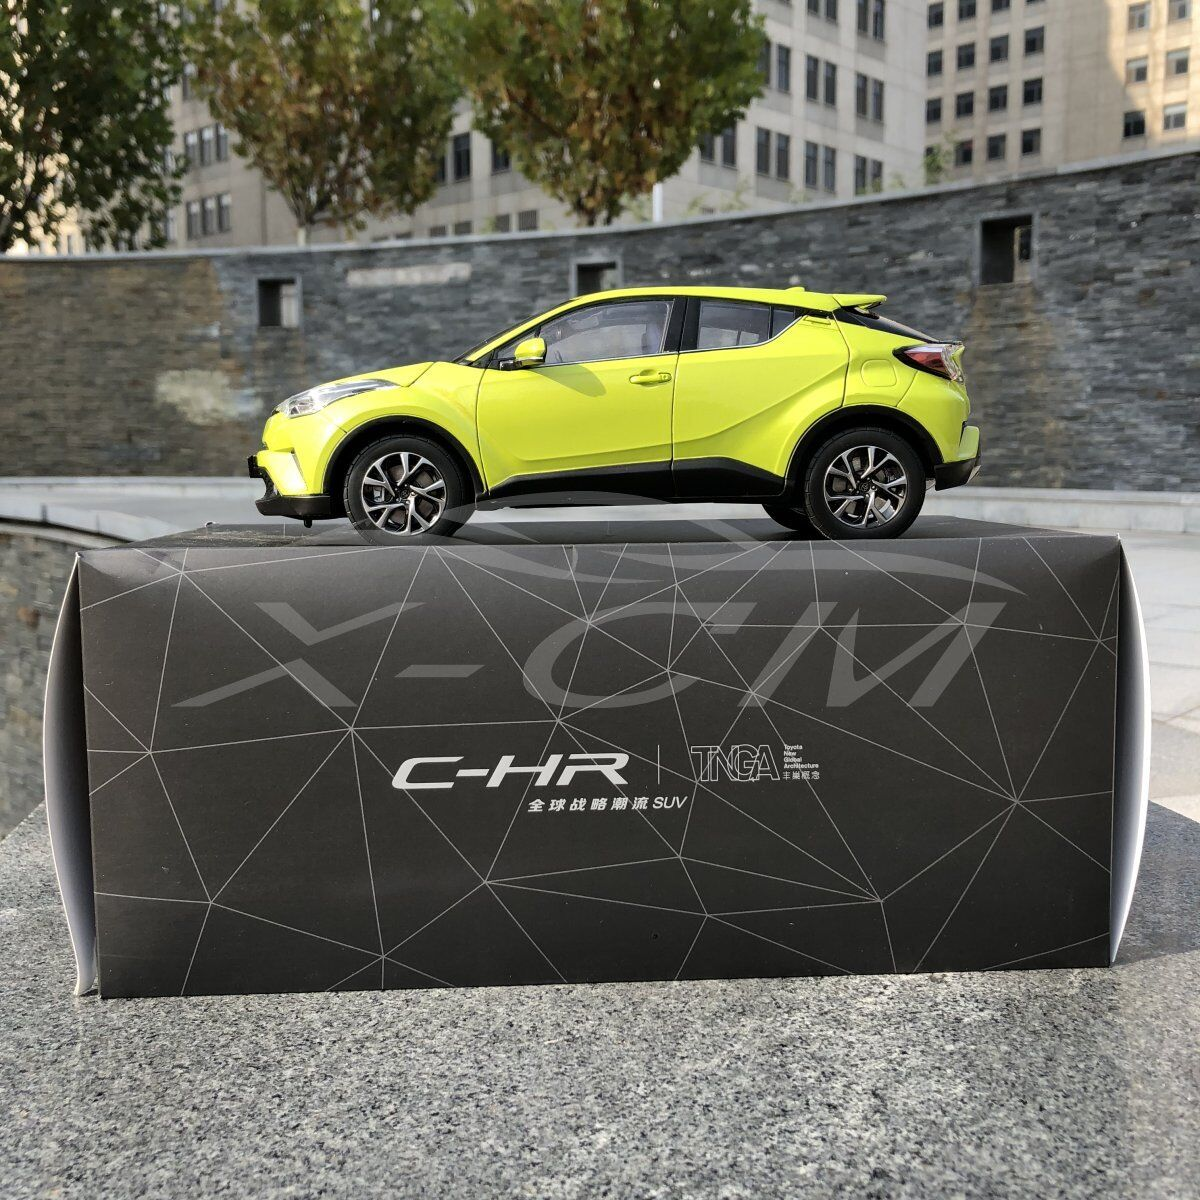 Diecast Car Model Toyota C-HR CHR 1 18 (Yellow Green) + GIFT